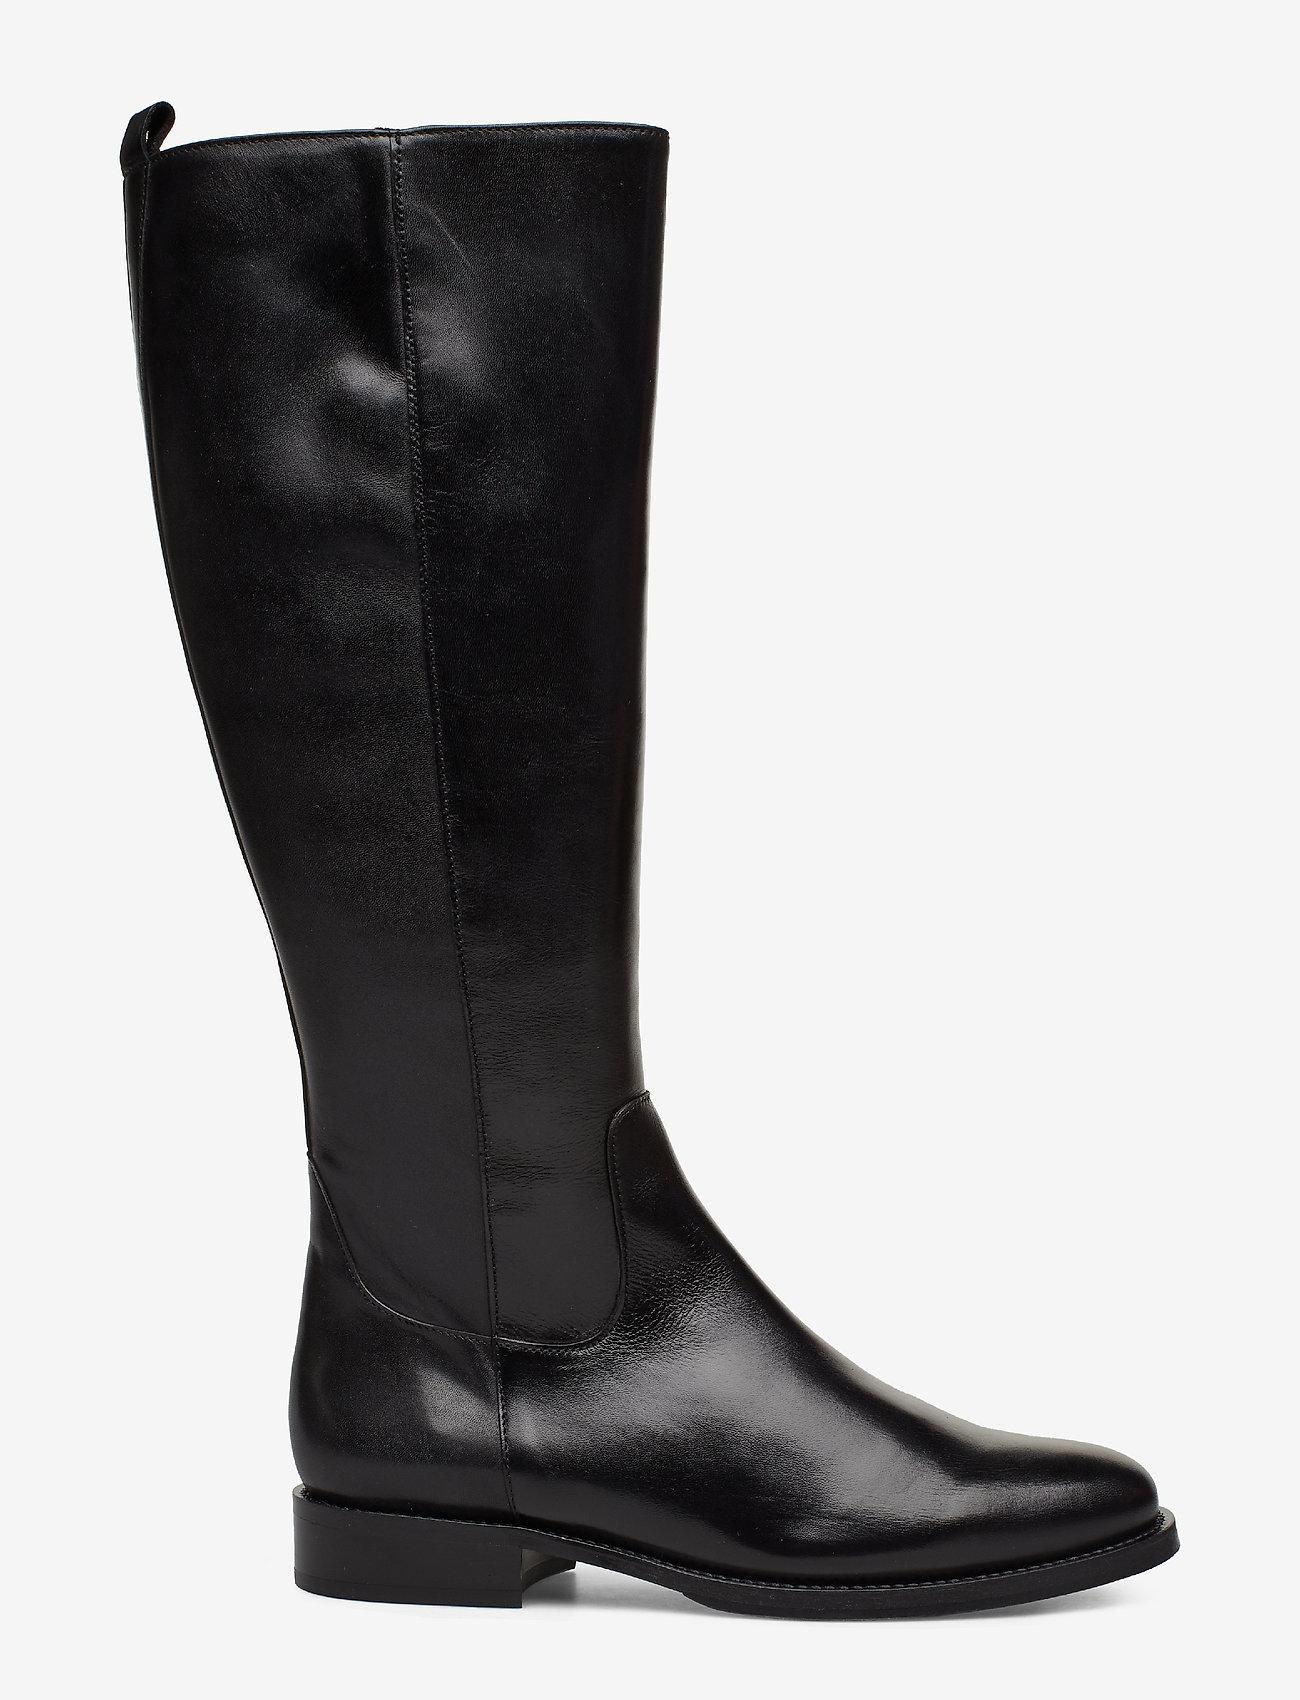 Billi Bi - Long Boots 3515 - pitkävartiset saappaat - black calf 80